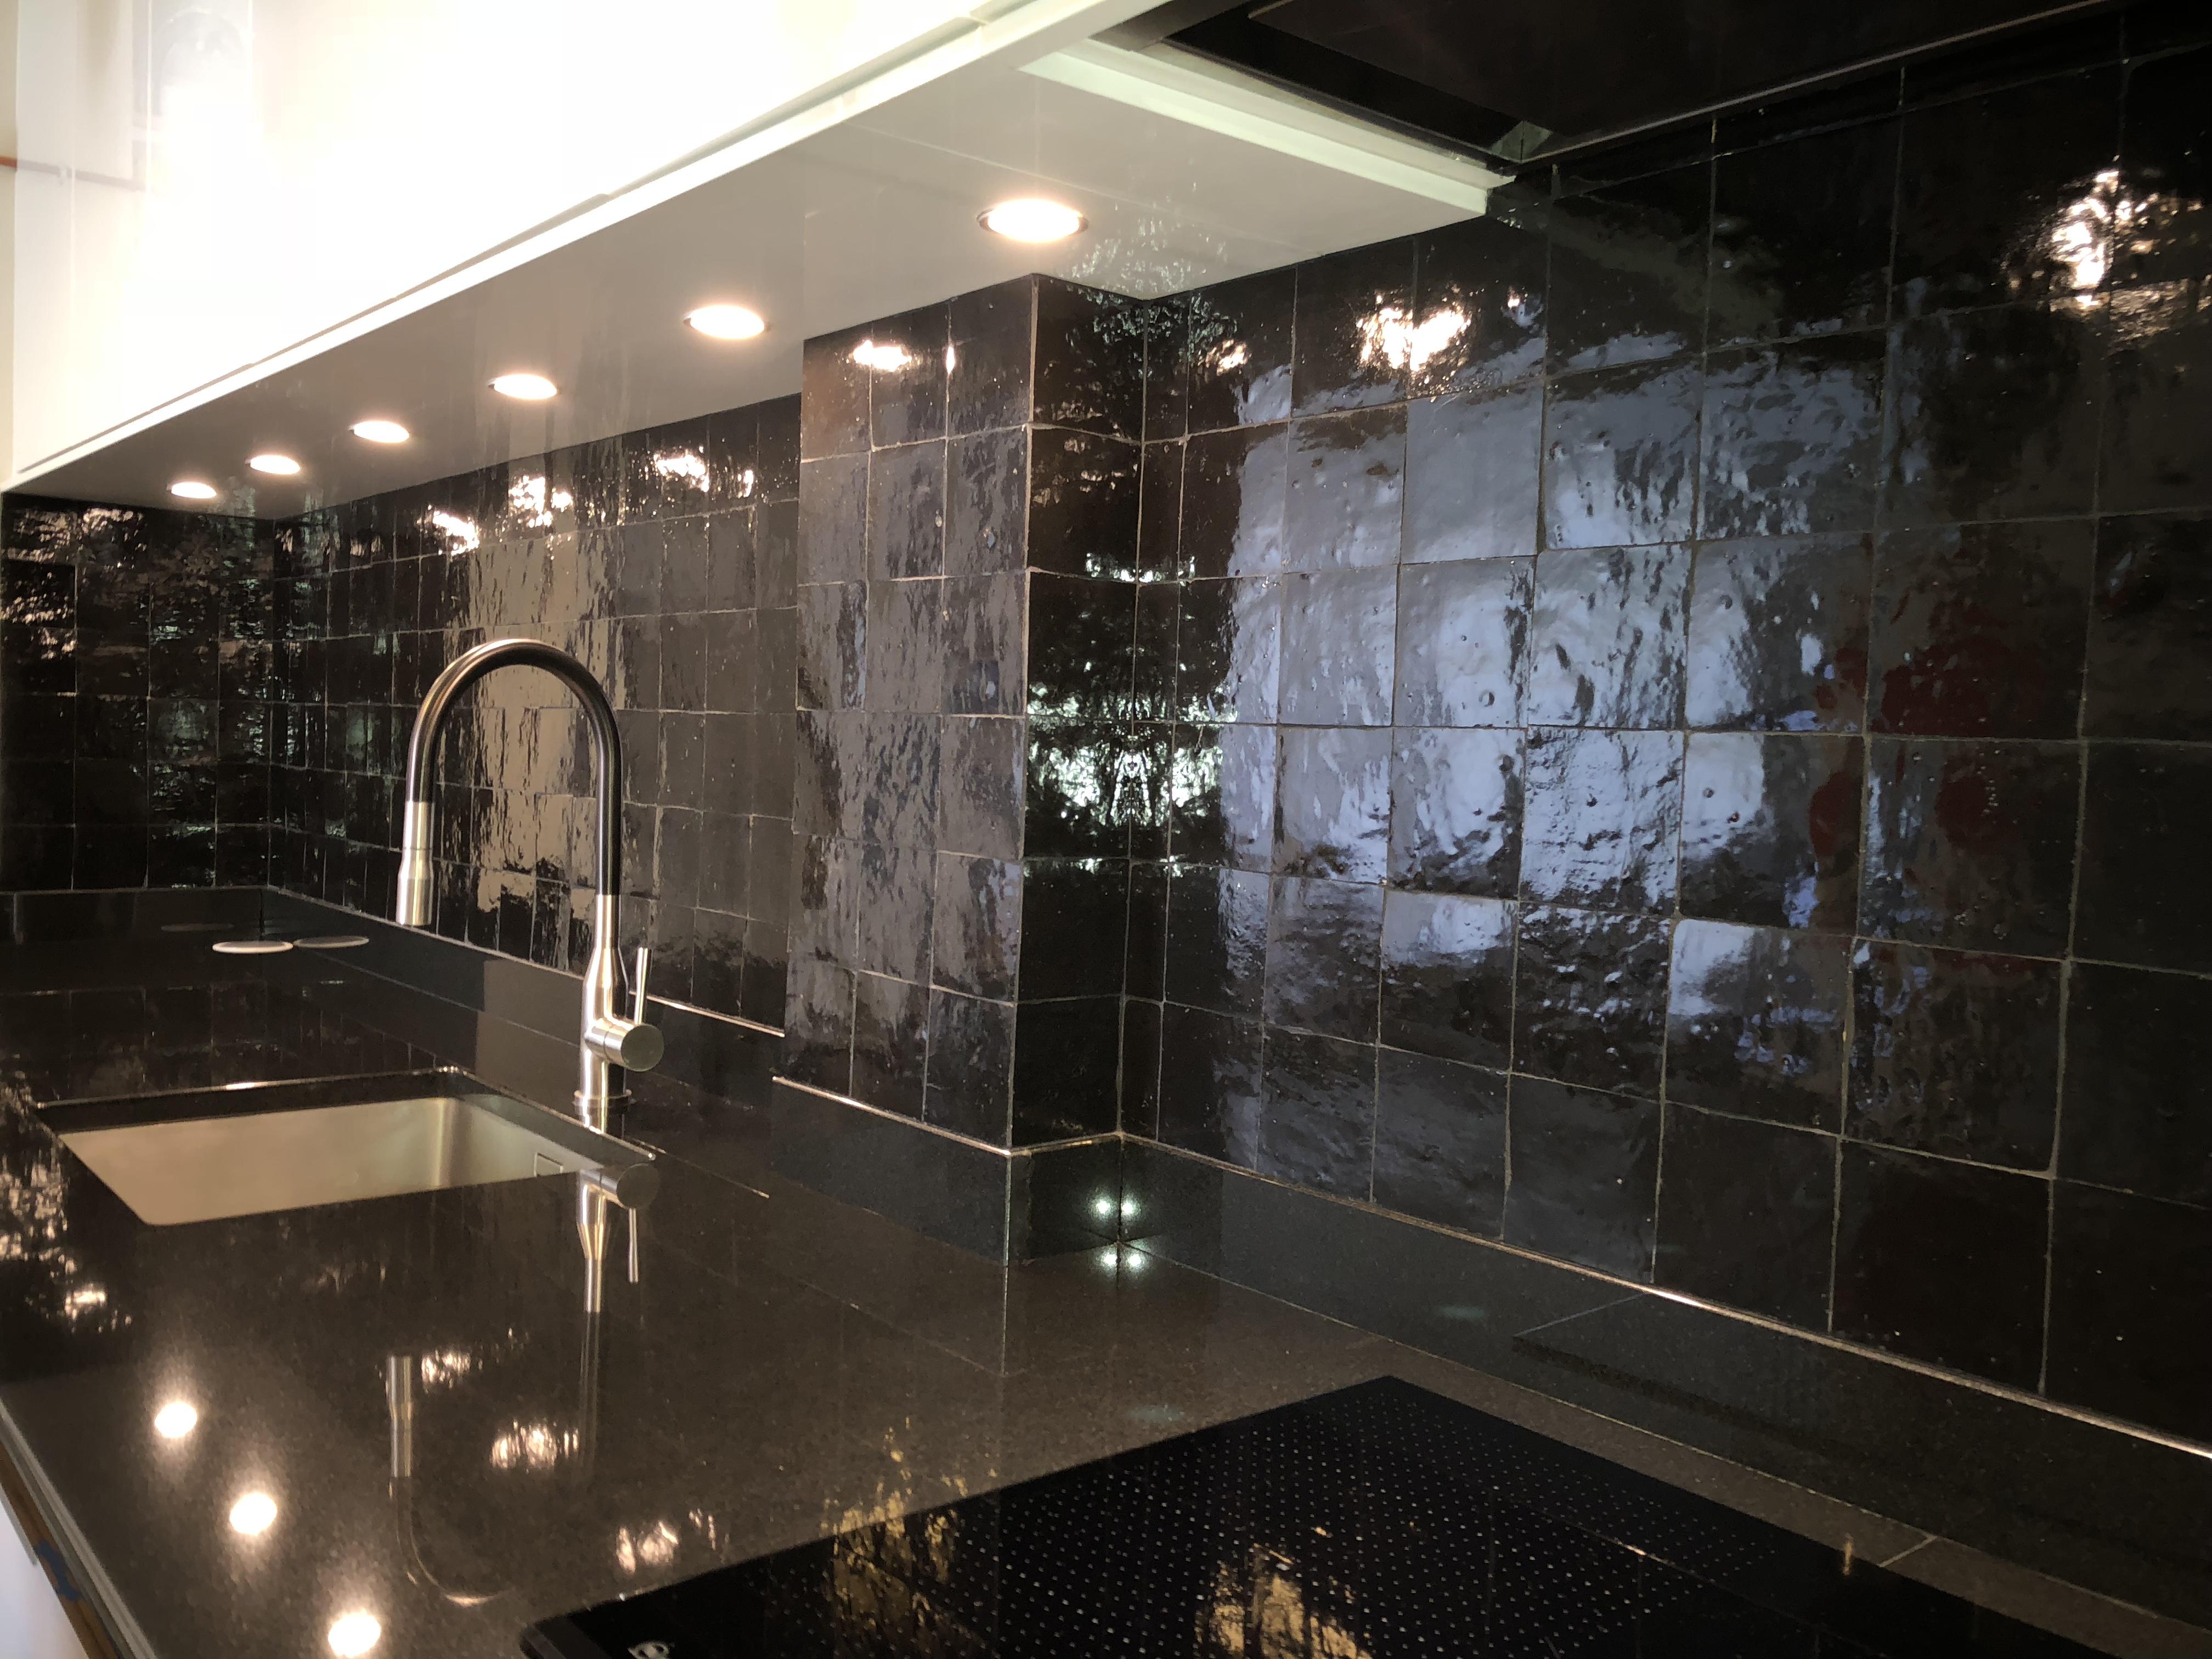 zellige zellige noir n 30 charme parquet paris. Black Bedroom Furniture Sets. Home Design Ideas